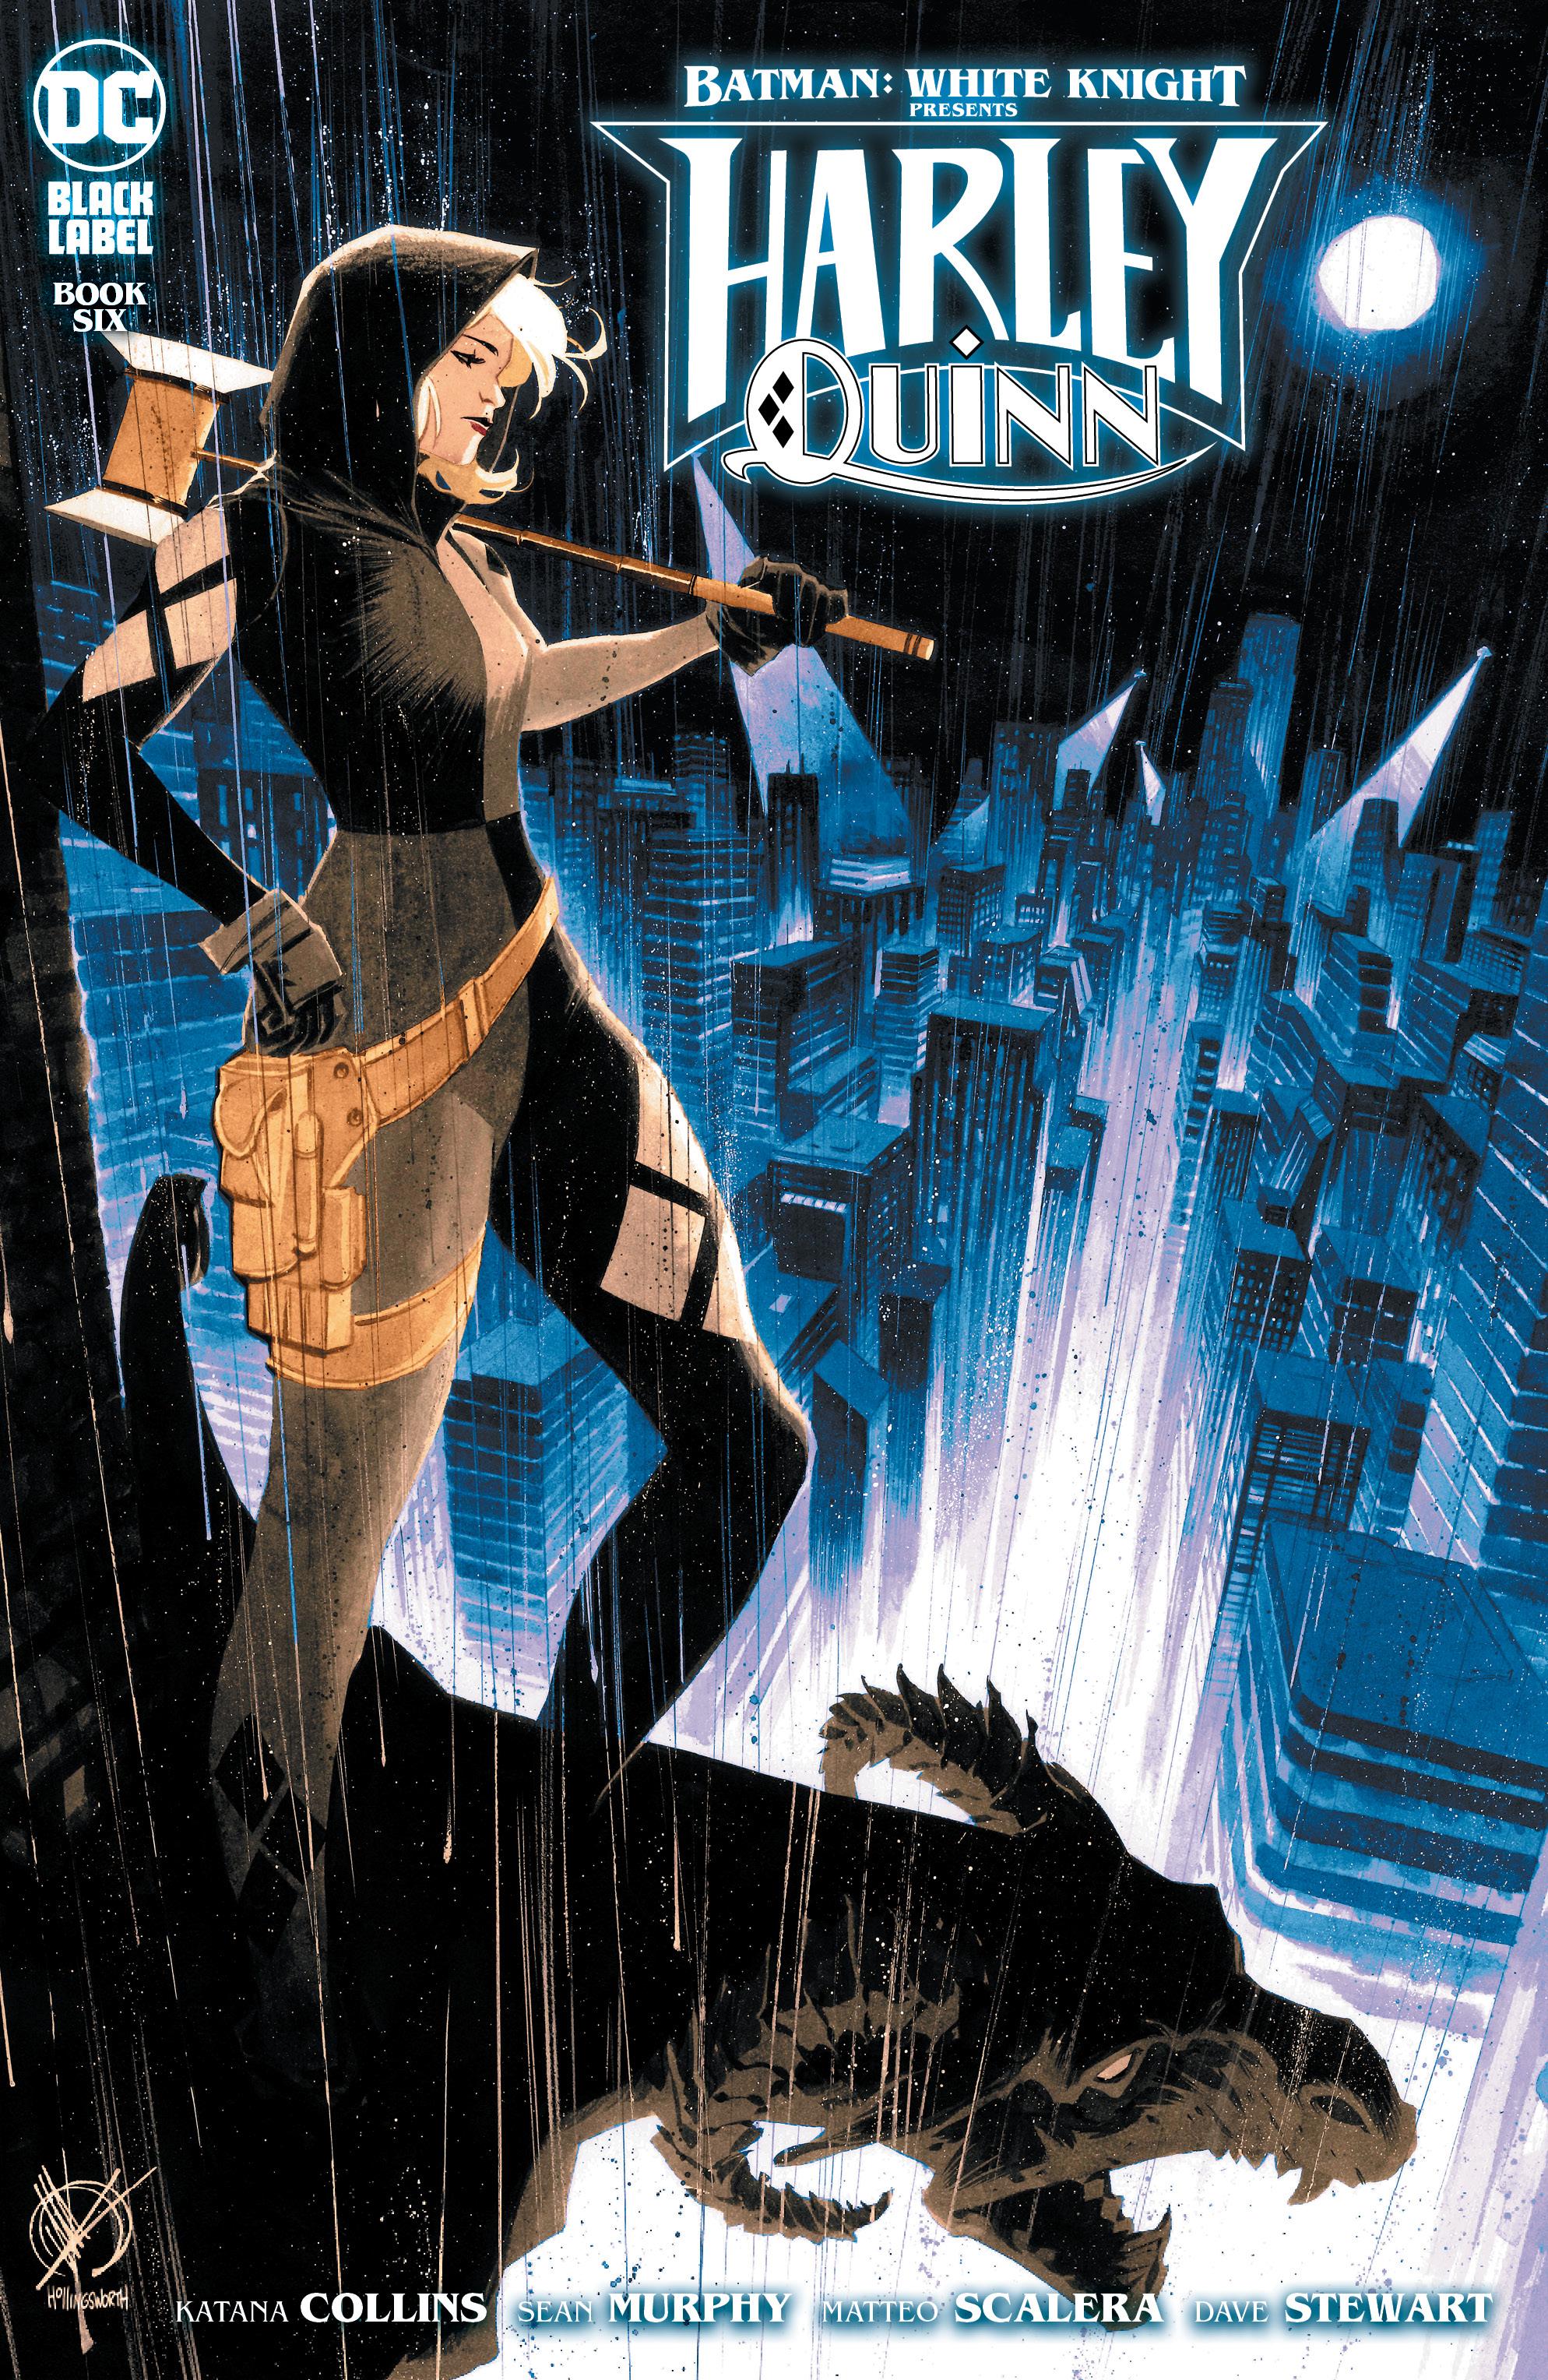 BATMAN WHITE KNIGHT PRESENTS HARLEY QUINN